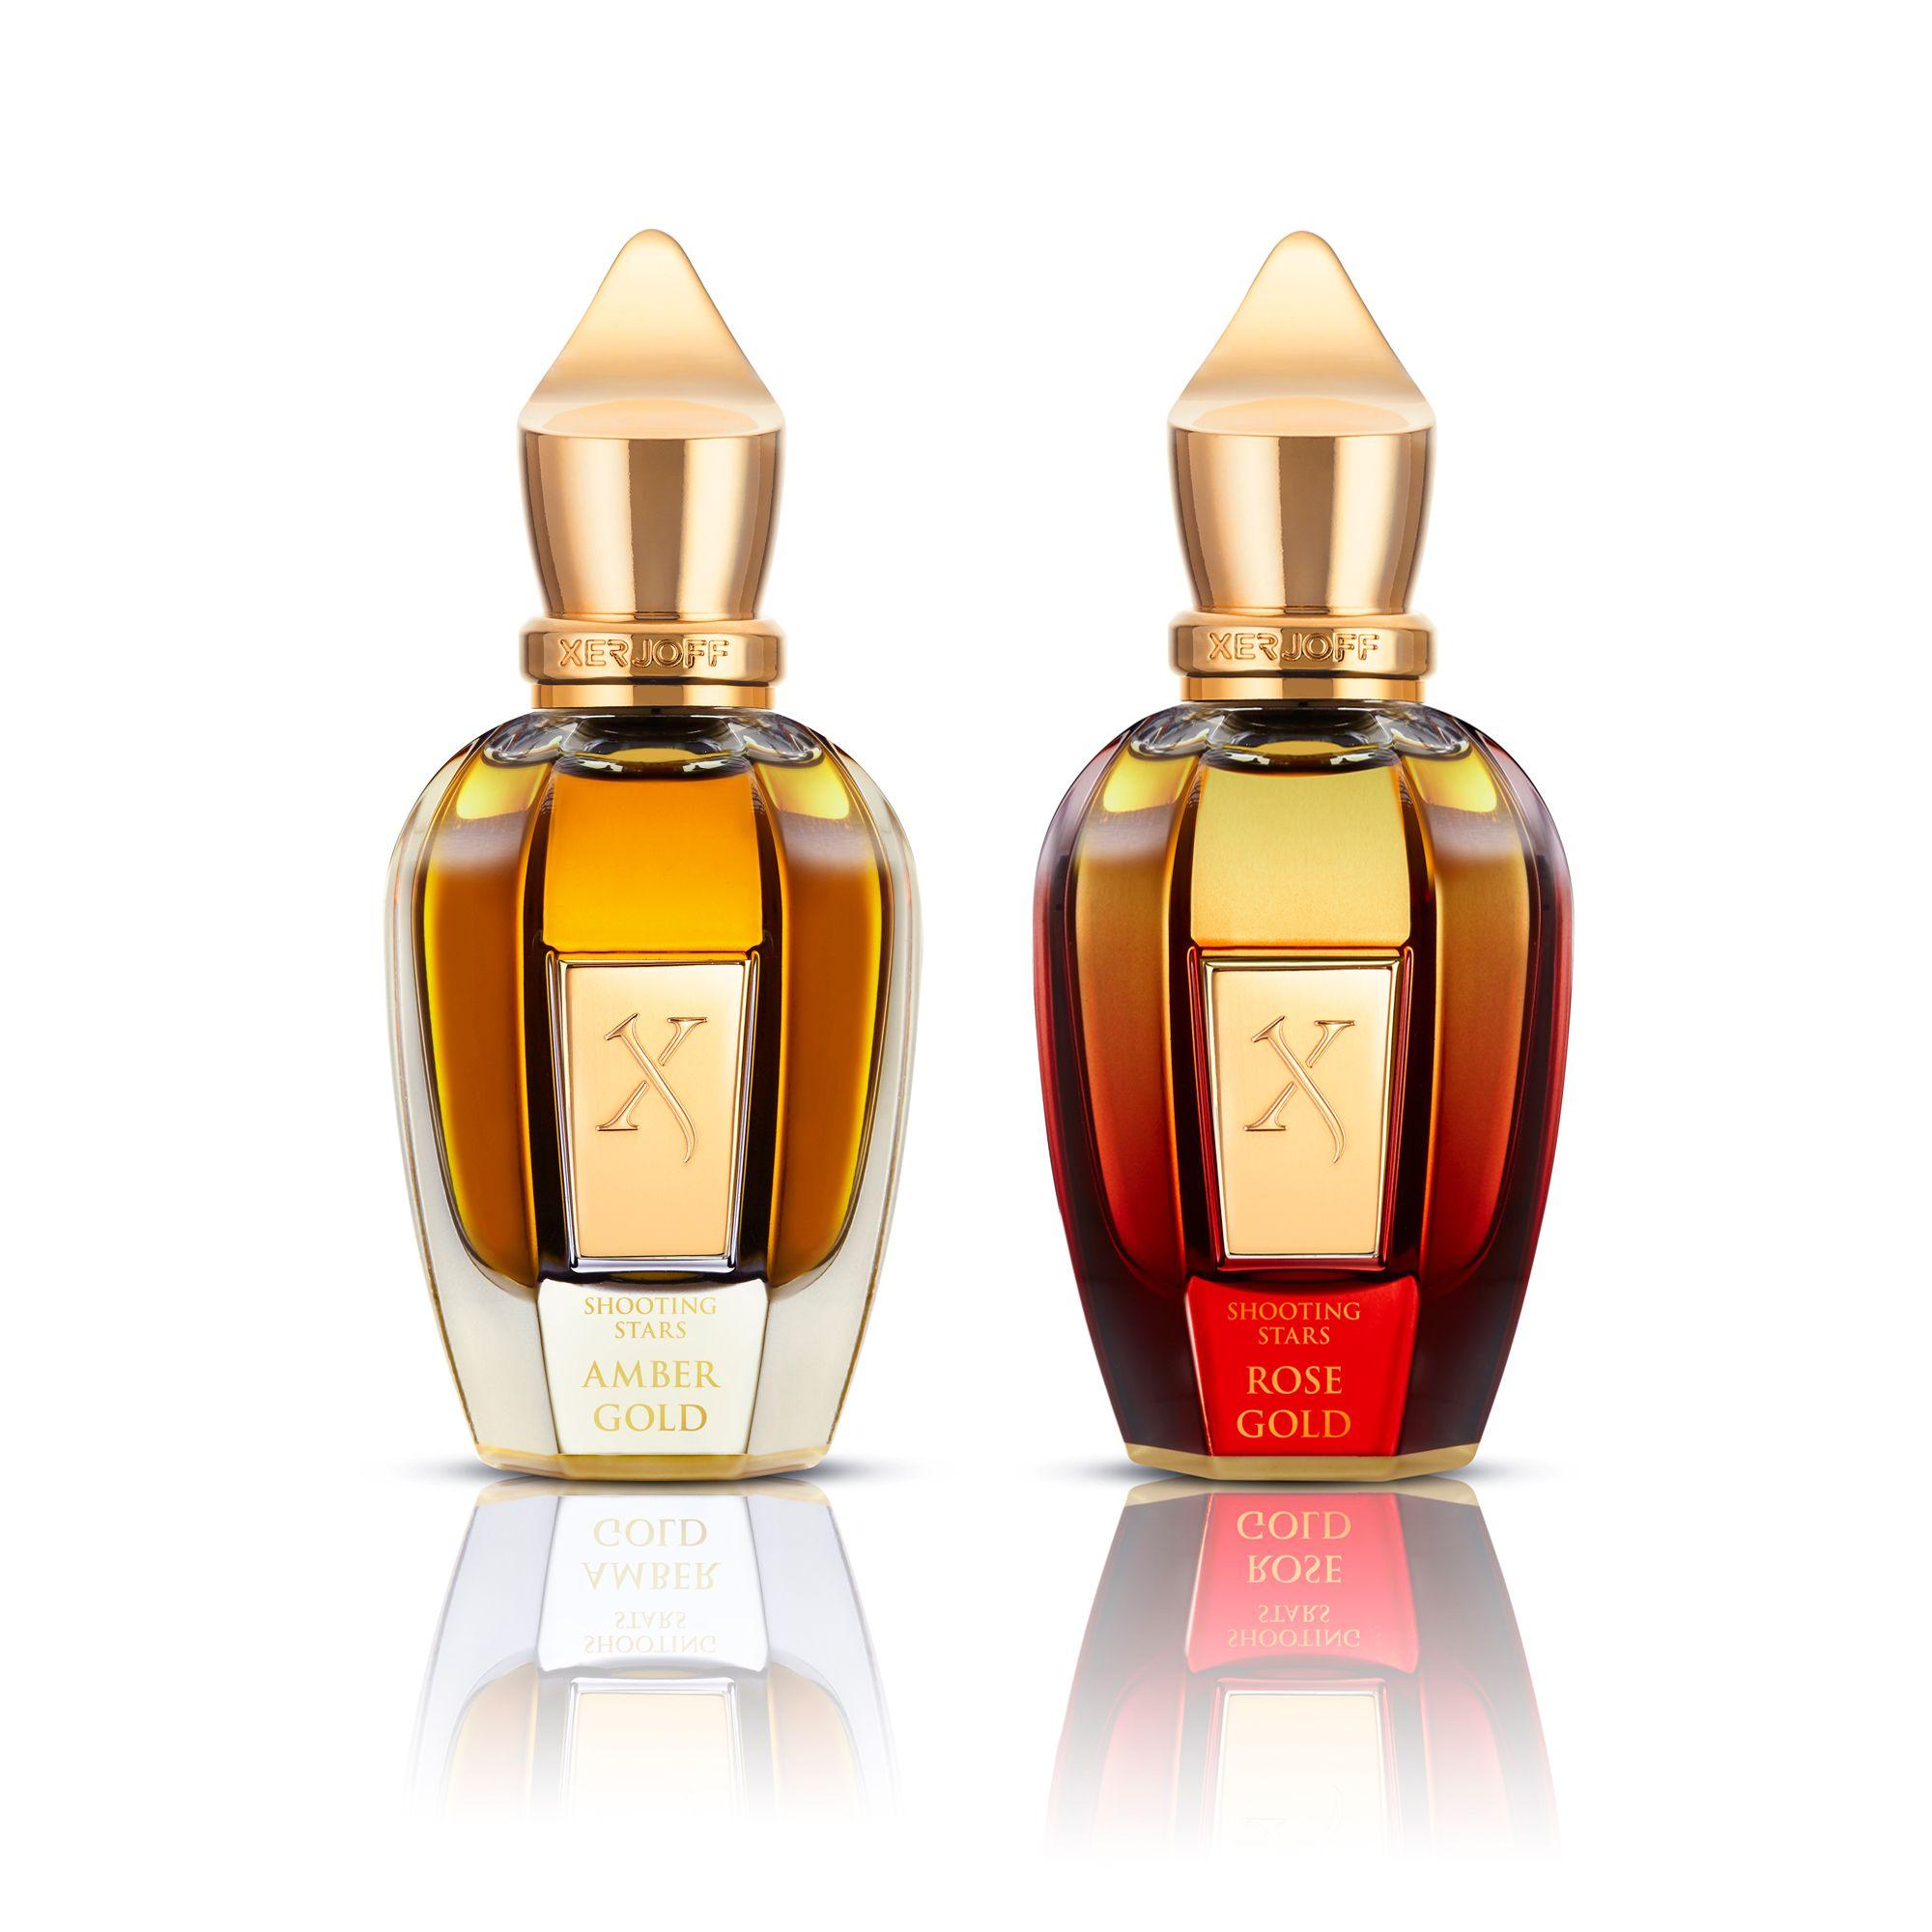 XerJoff - Shooting Stars - Amber Gold und Rose Gold Set - Parfum 2 x 50 ml